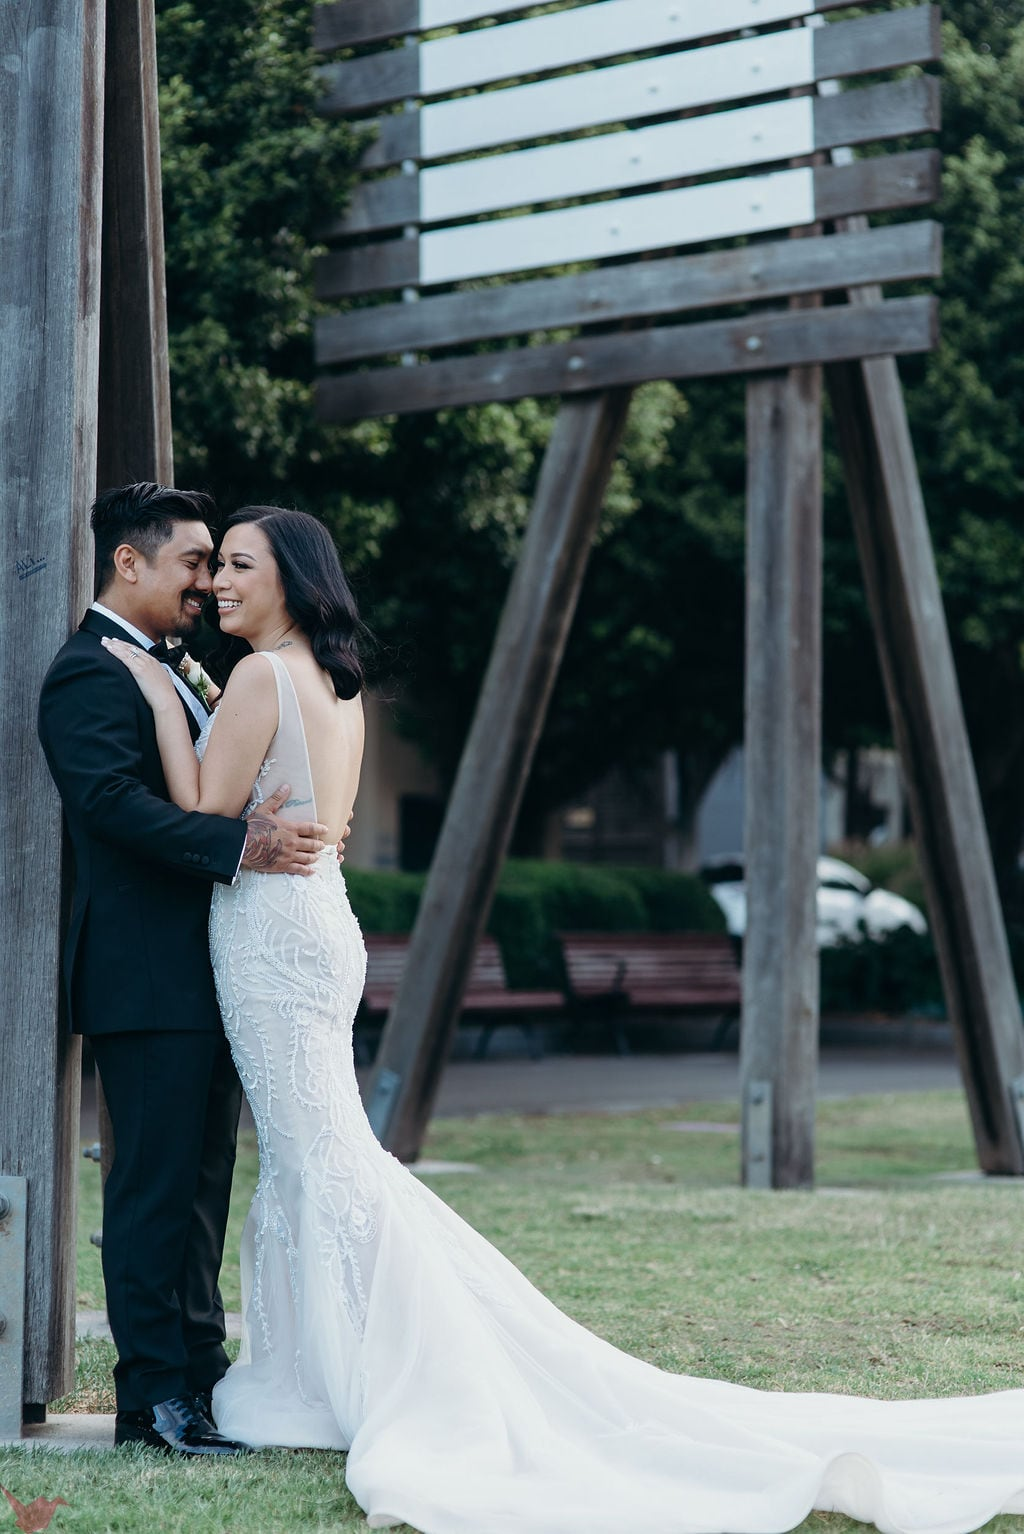 james-felicia-papercrane-wedding-photography-24.jpg